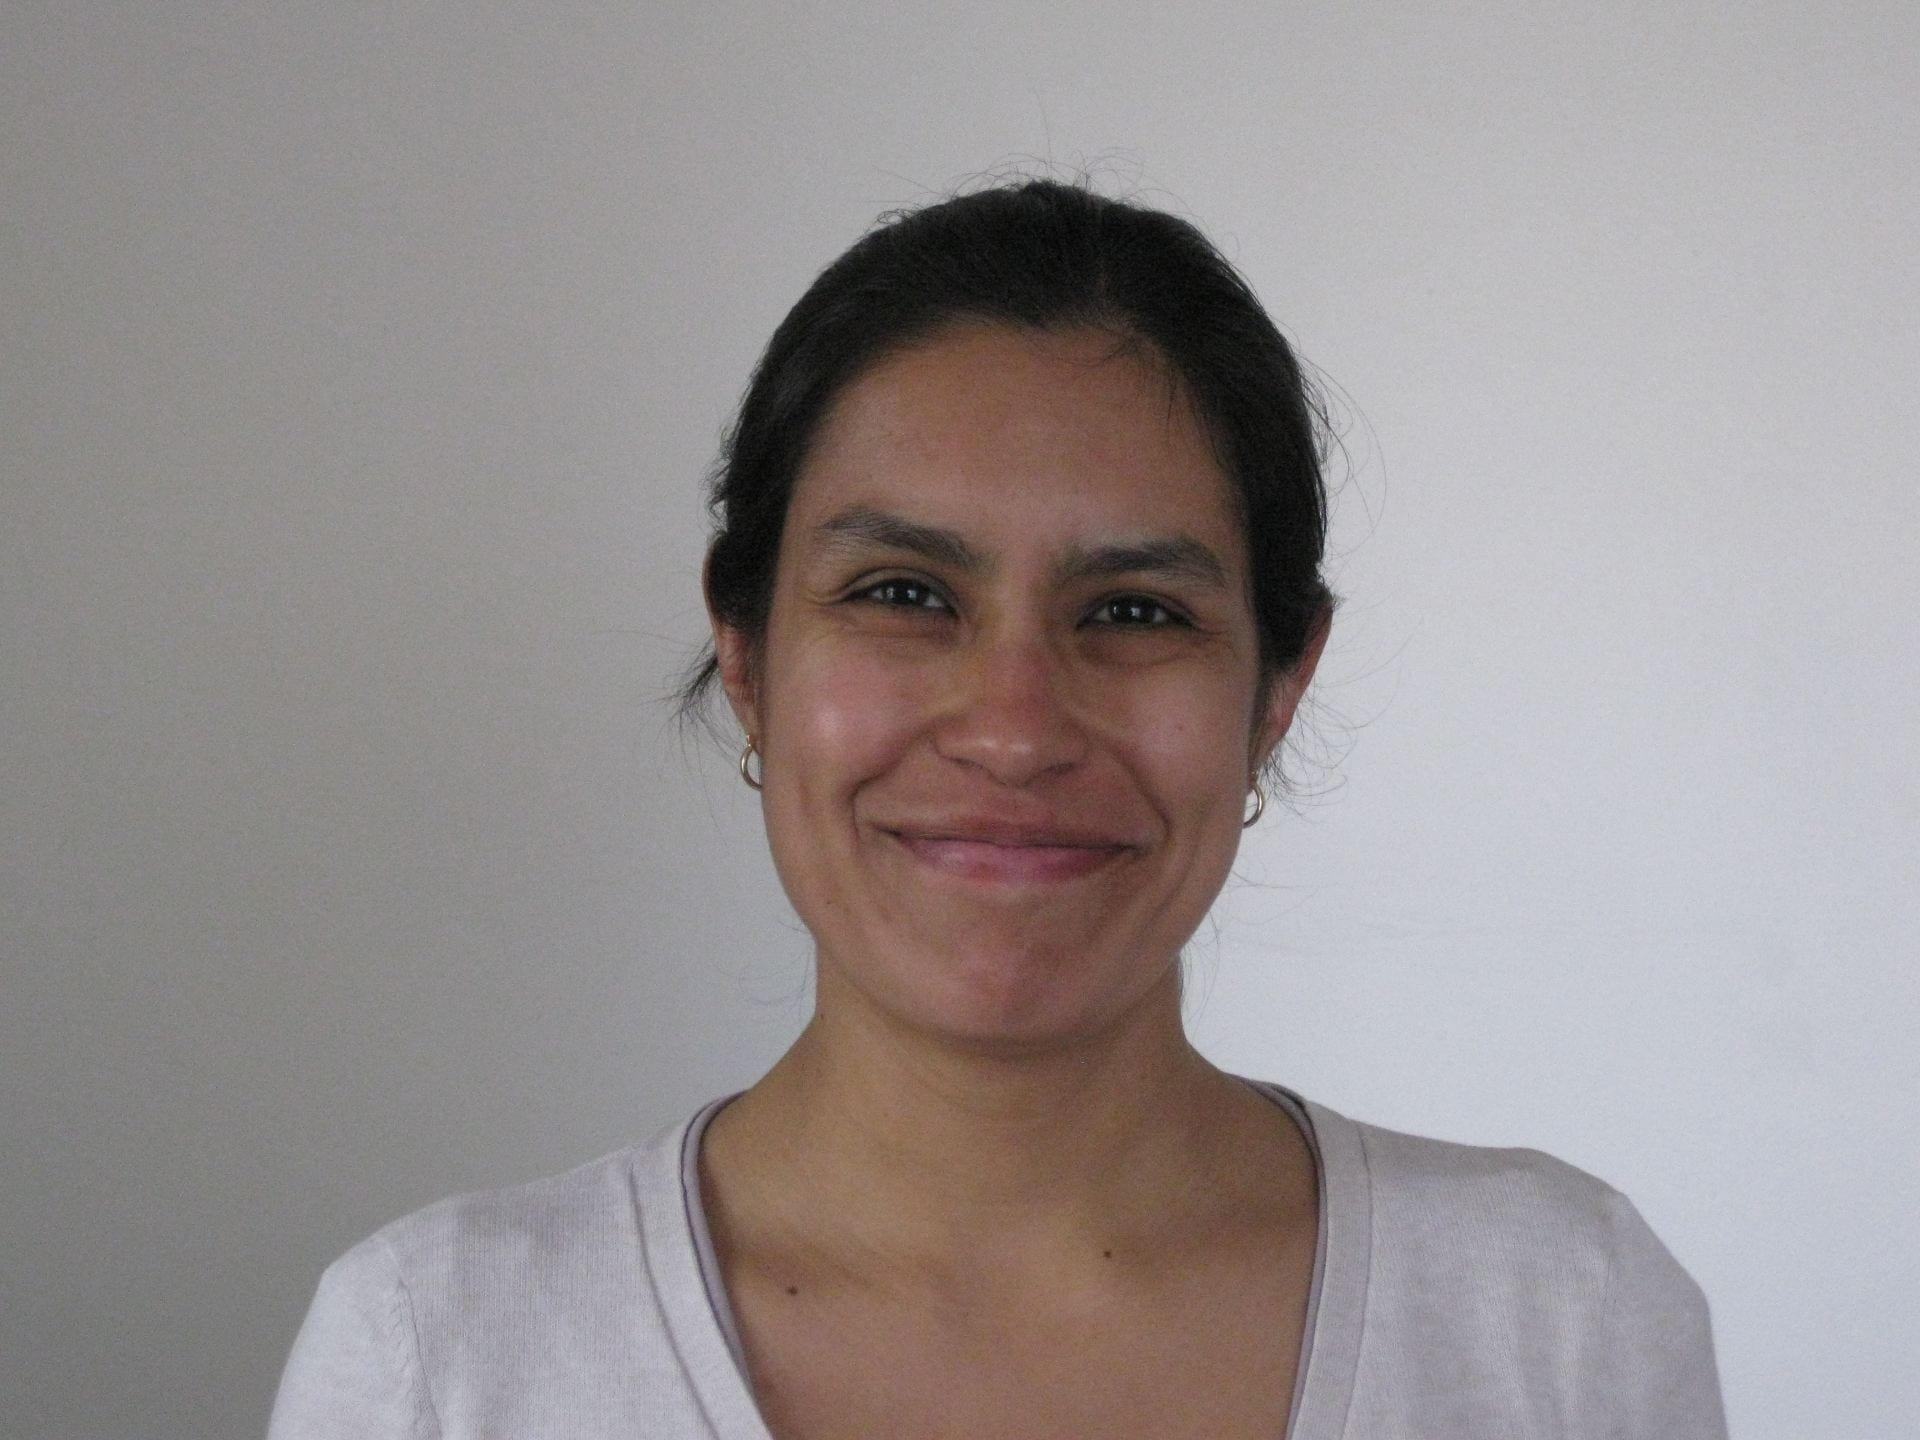 Citlali Perez-Campos